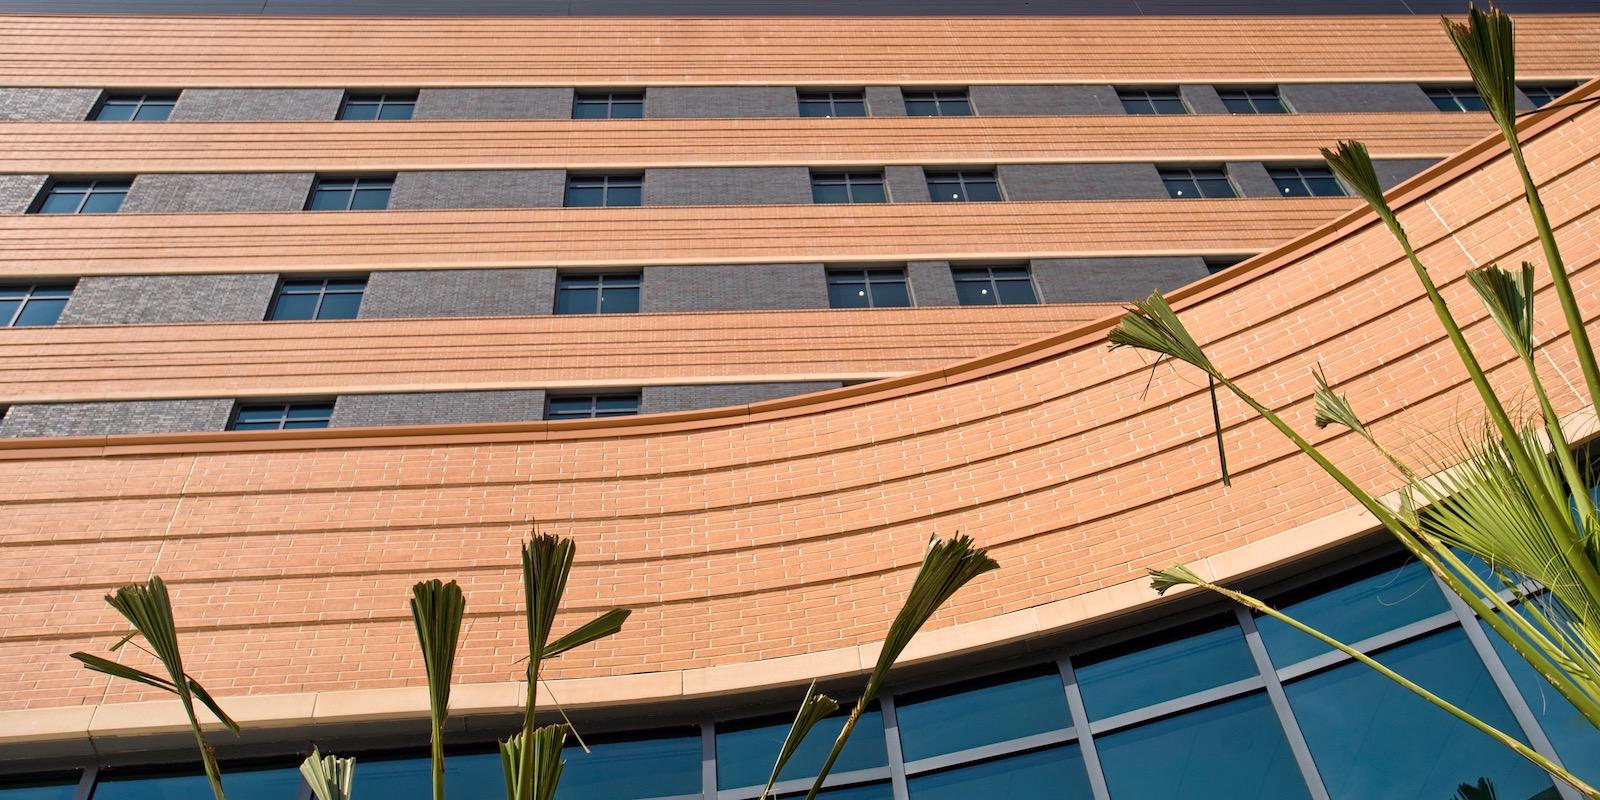 Cast Stone Banding Design Accentuate the Building Exterior